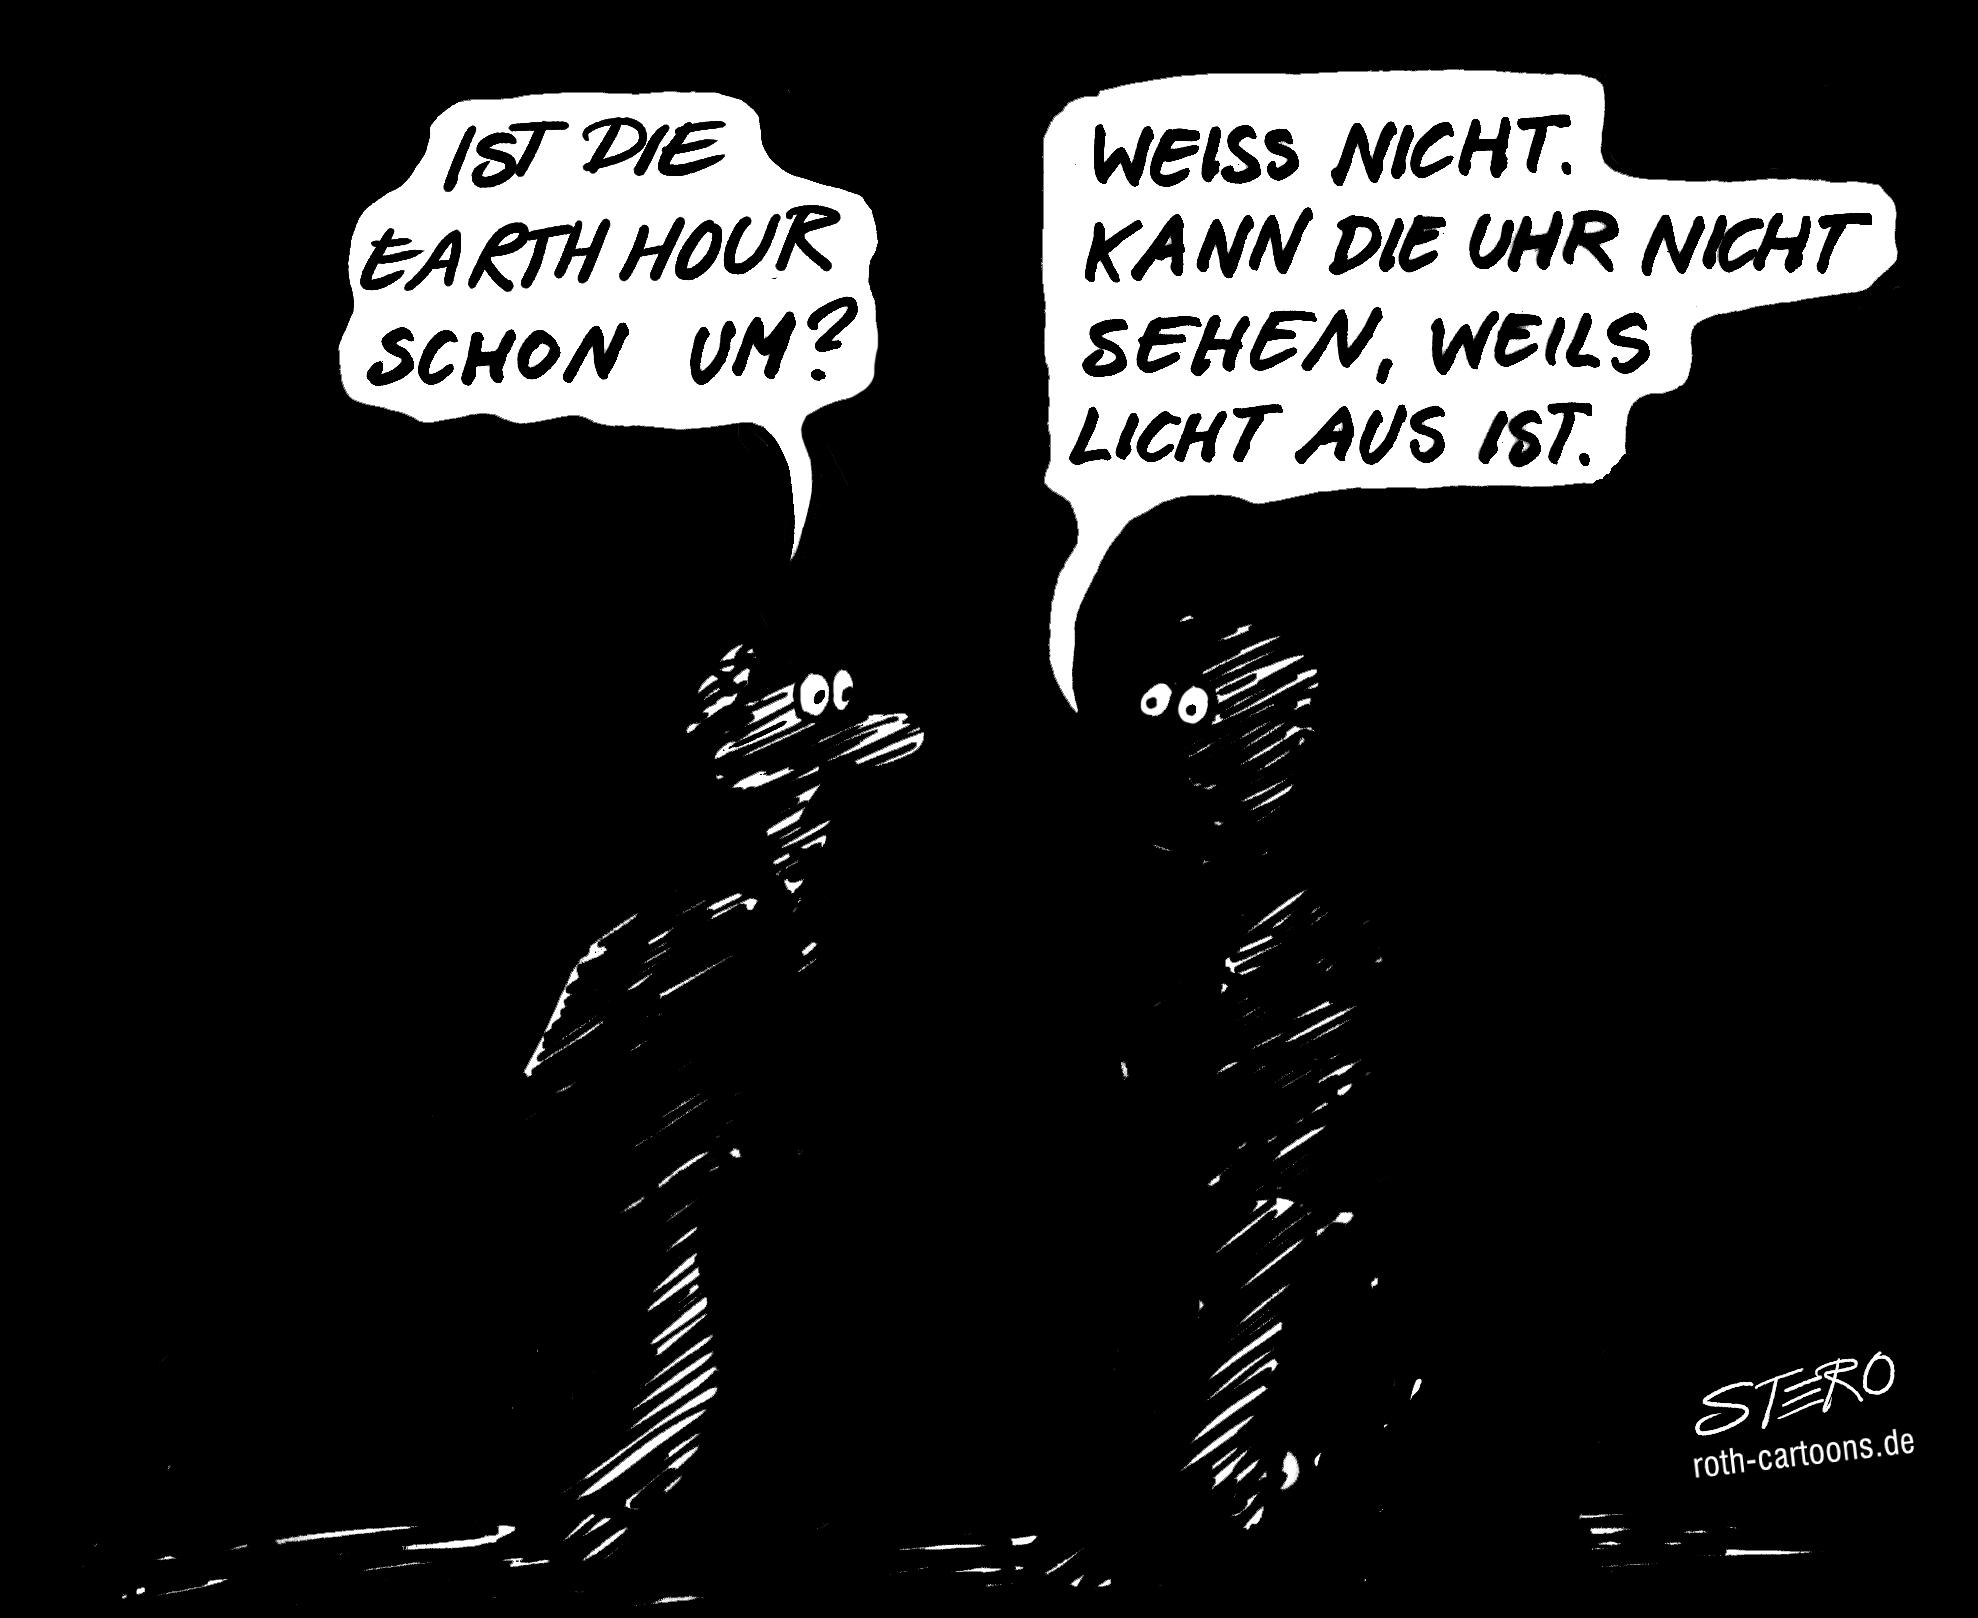 CArtoon Karikatur zur Earth Hour